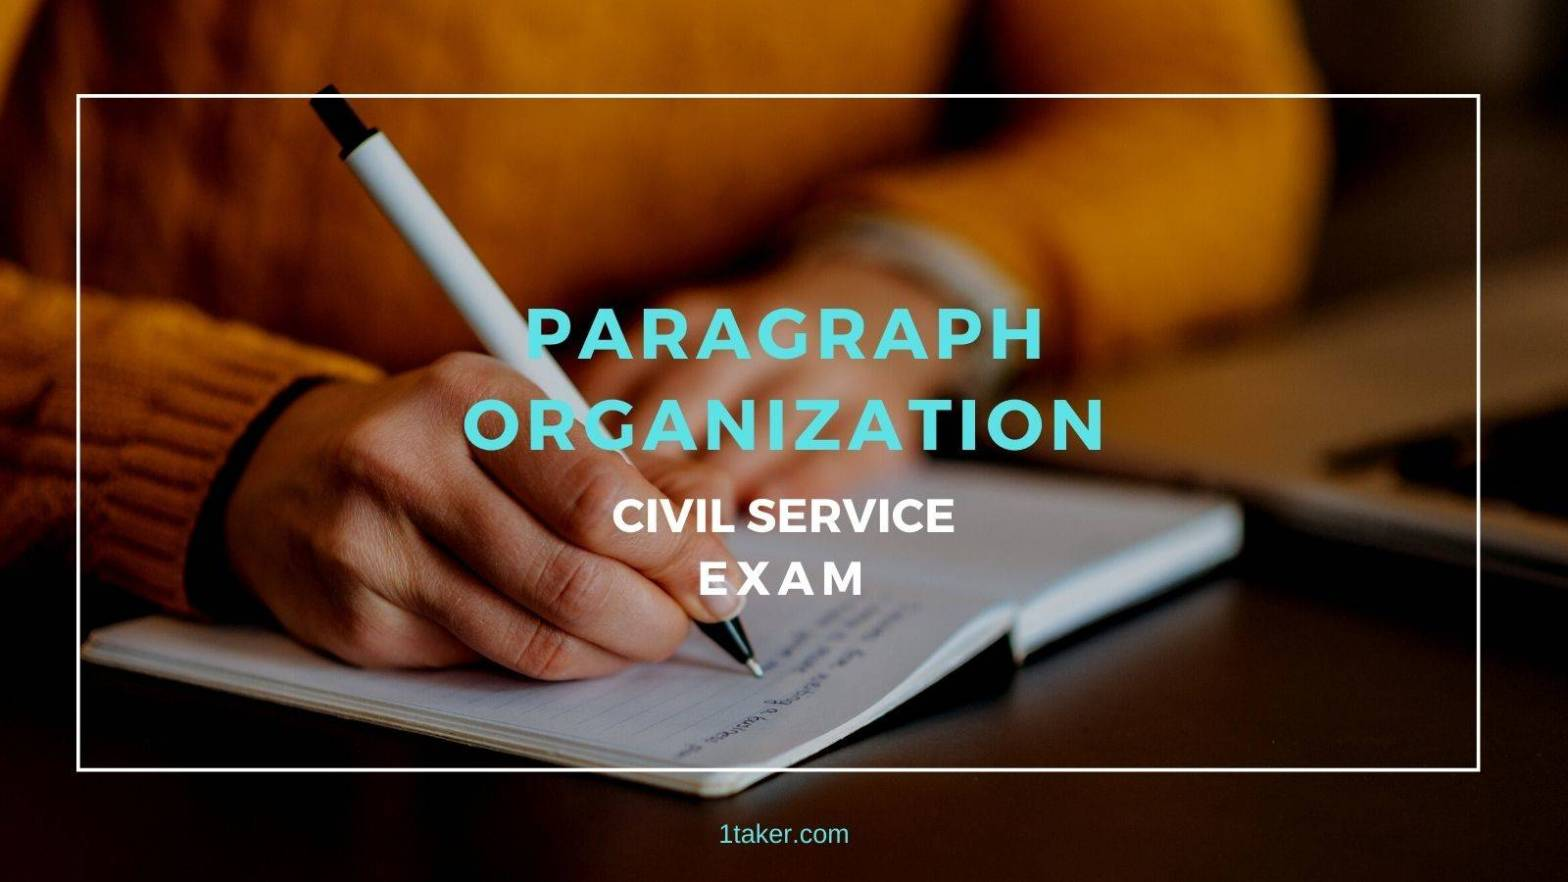 paragraph organization civil service exam philippines